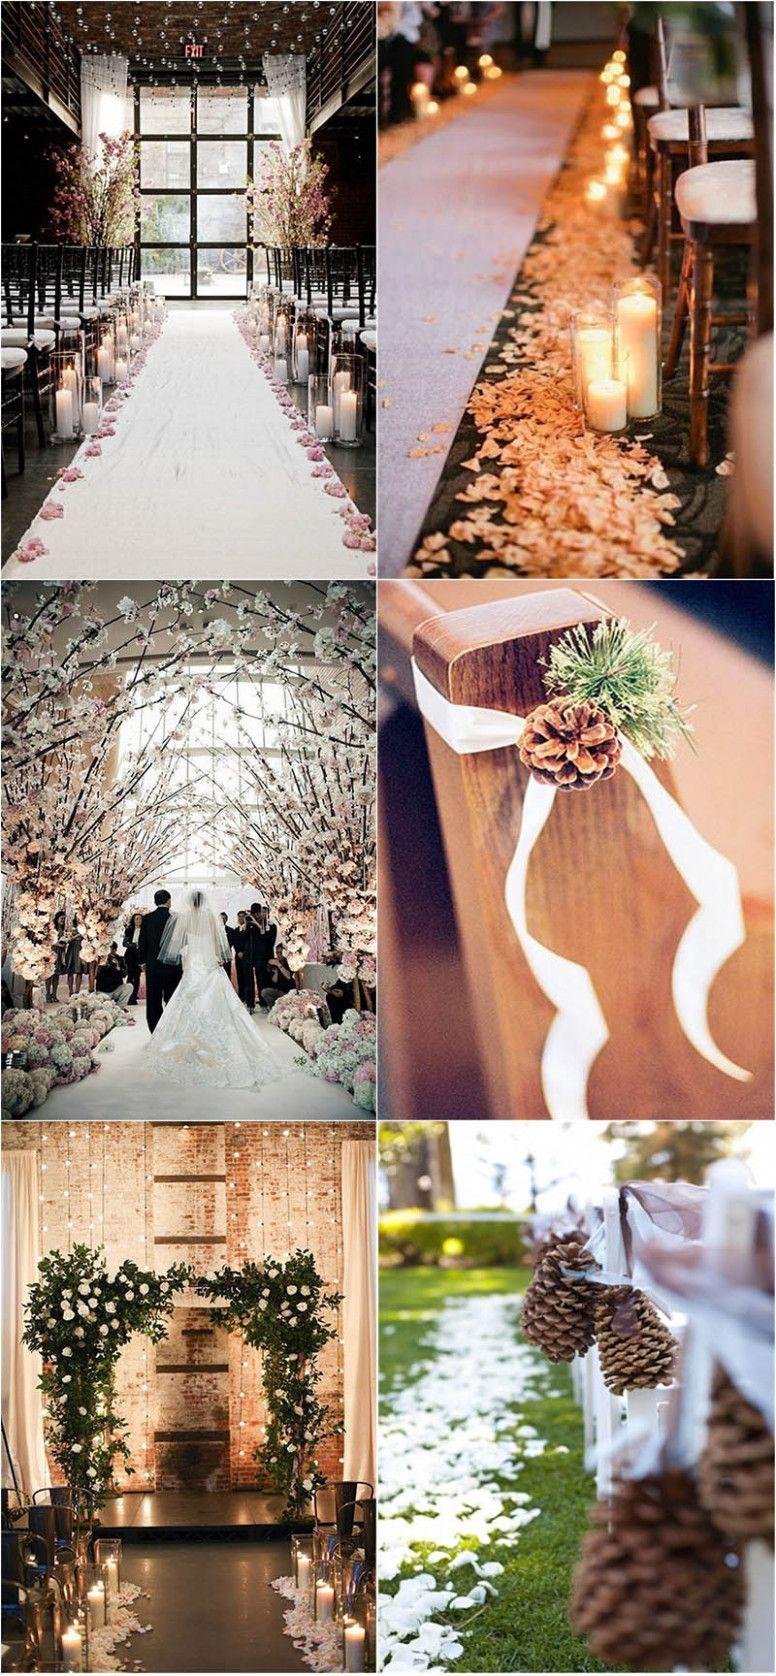 Wedding decoration ideas gold  Winter Wedding Décor Ideas That Will Take Your Breath Away  Wedding